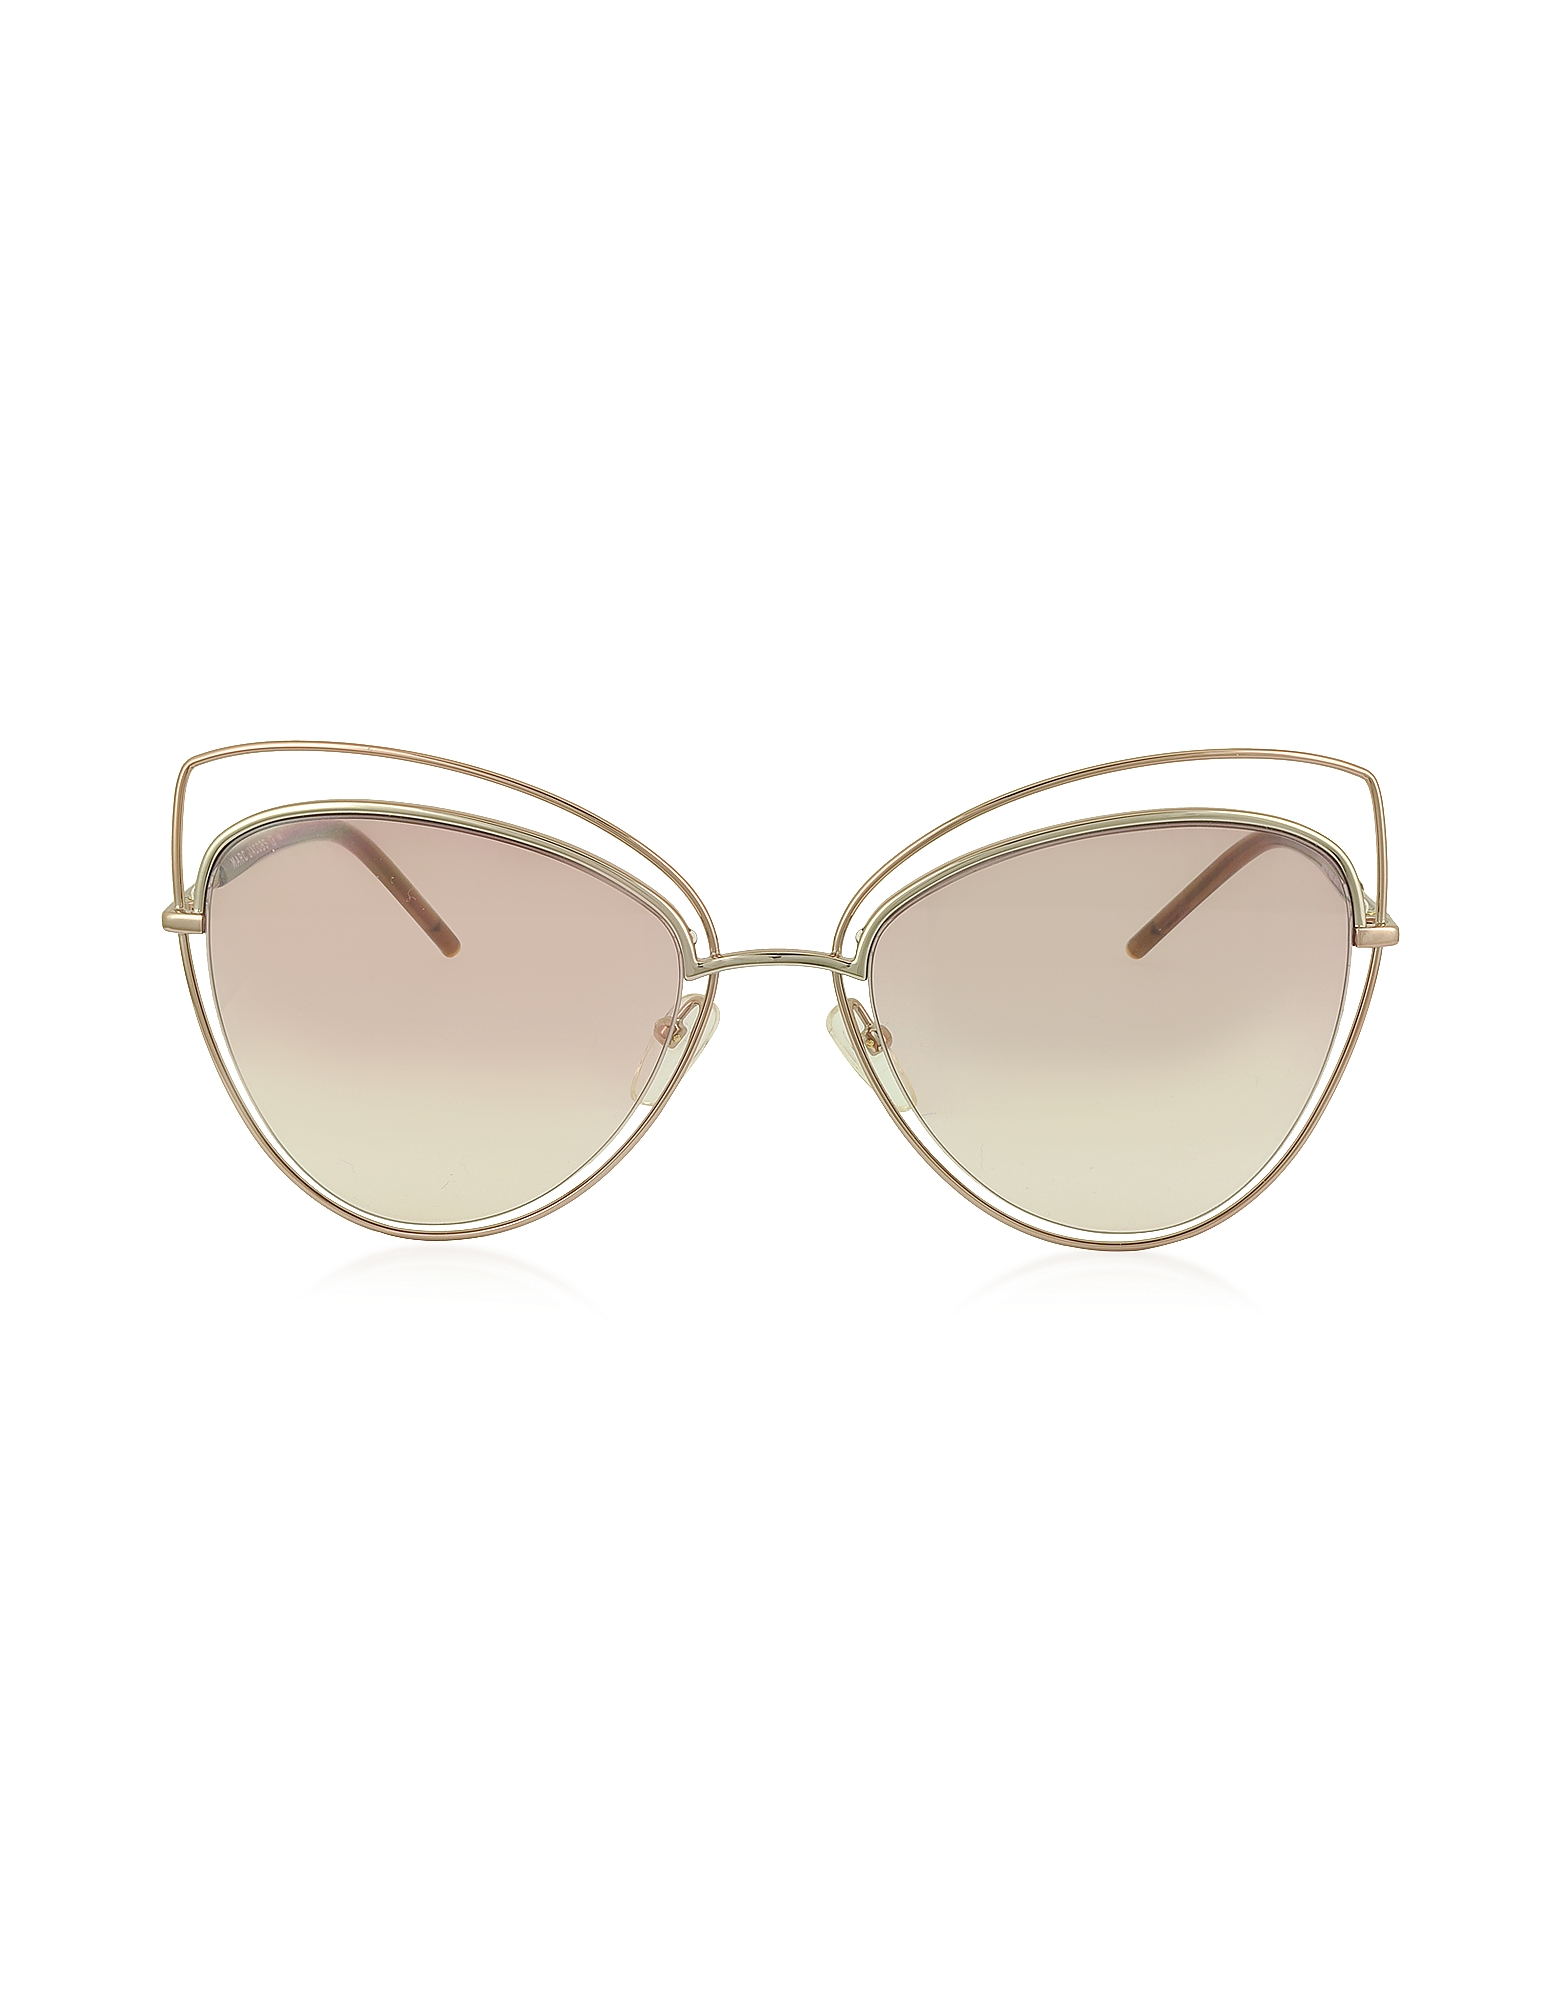 Marc Jacobs Sunglasses, MARC 8/S Metal and Acetate Cat Eye Women's Sunglasses